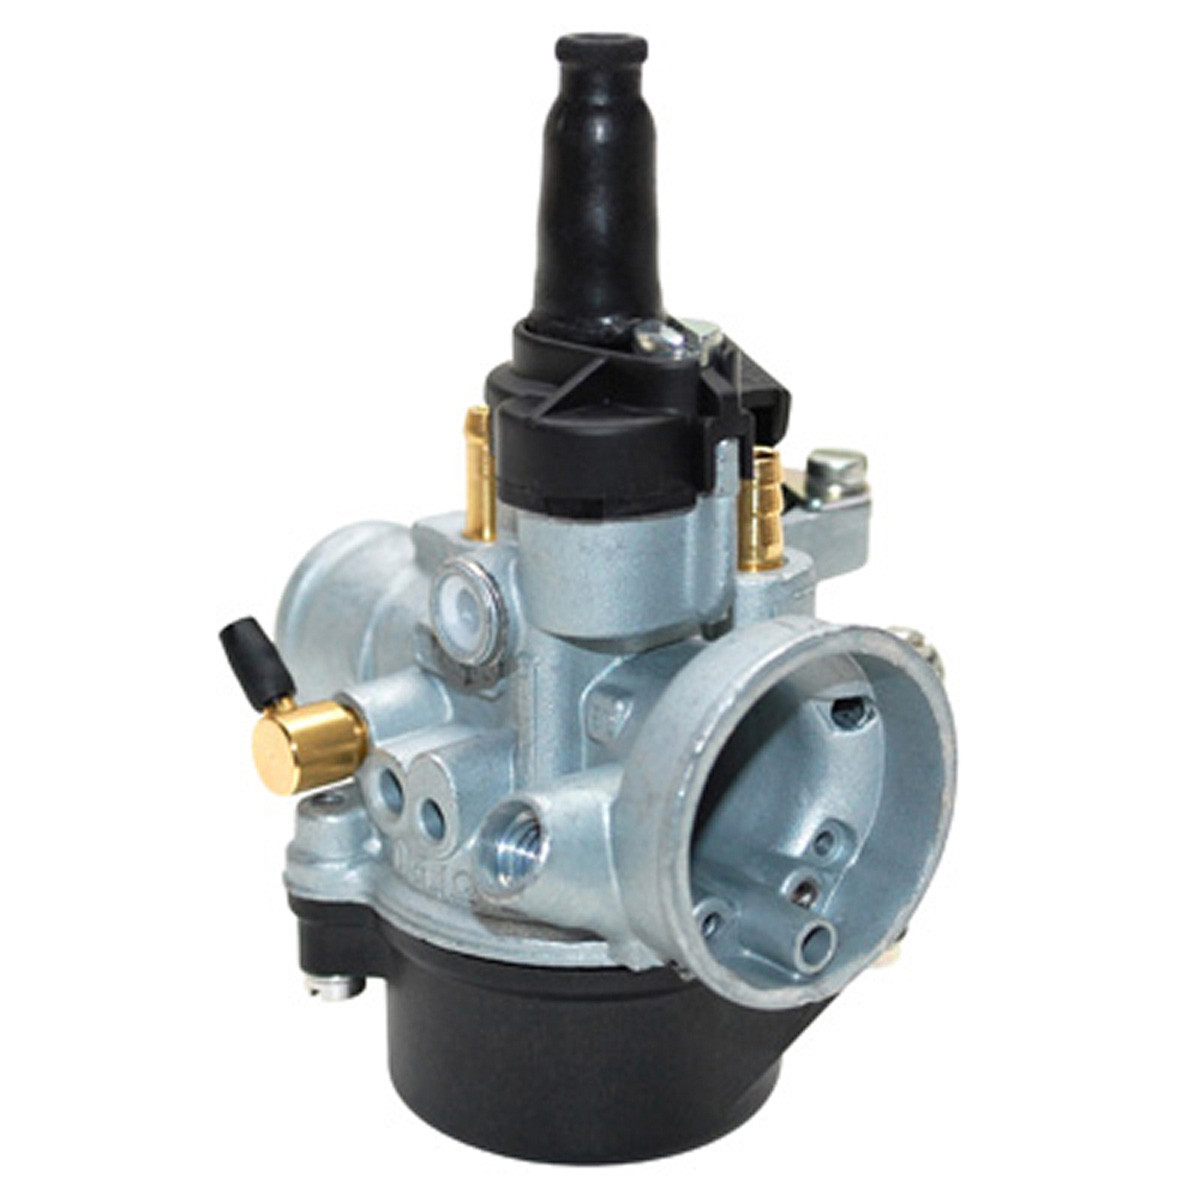 Carburateur Dellorto - PHVA 17.5 ED